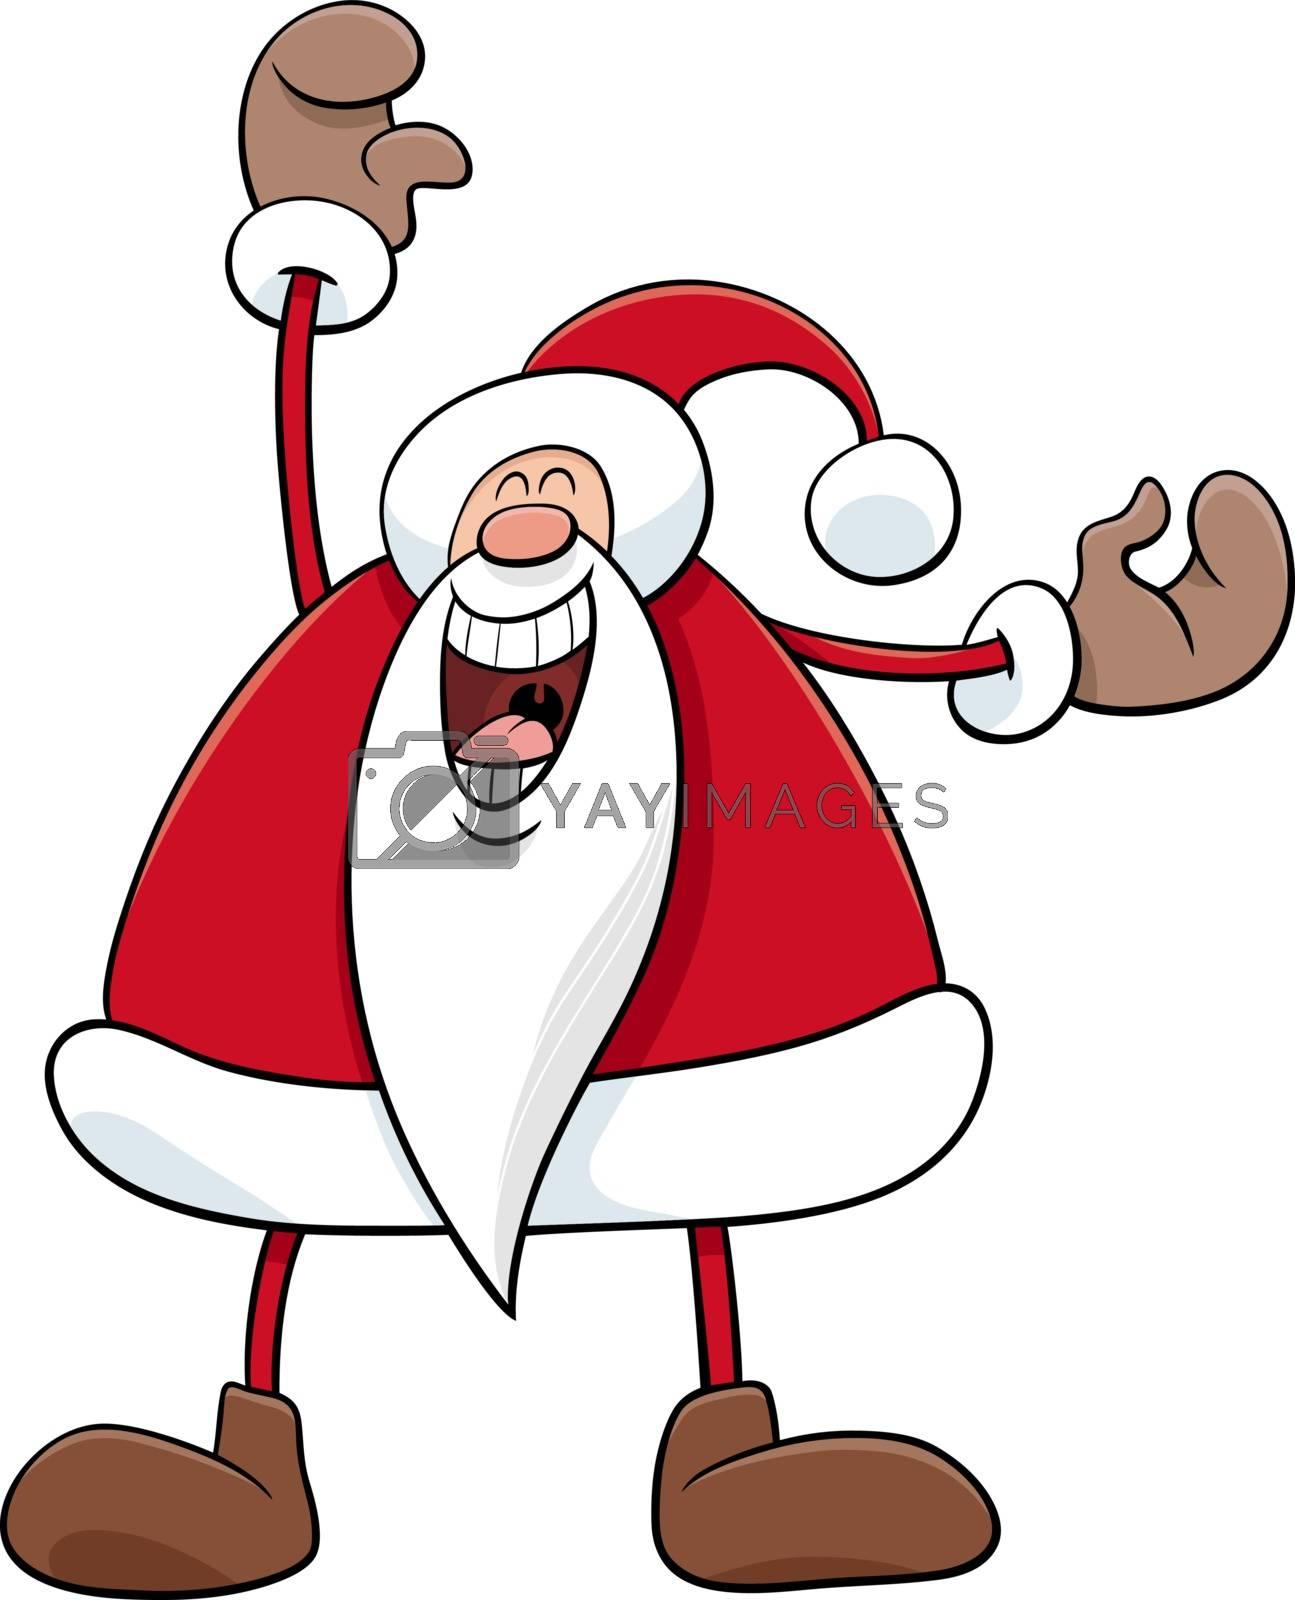 Cartoon Illustration of Happy Santa Claus Christmas Character